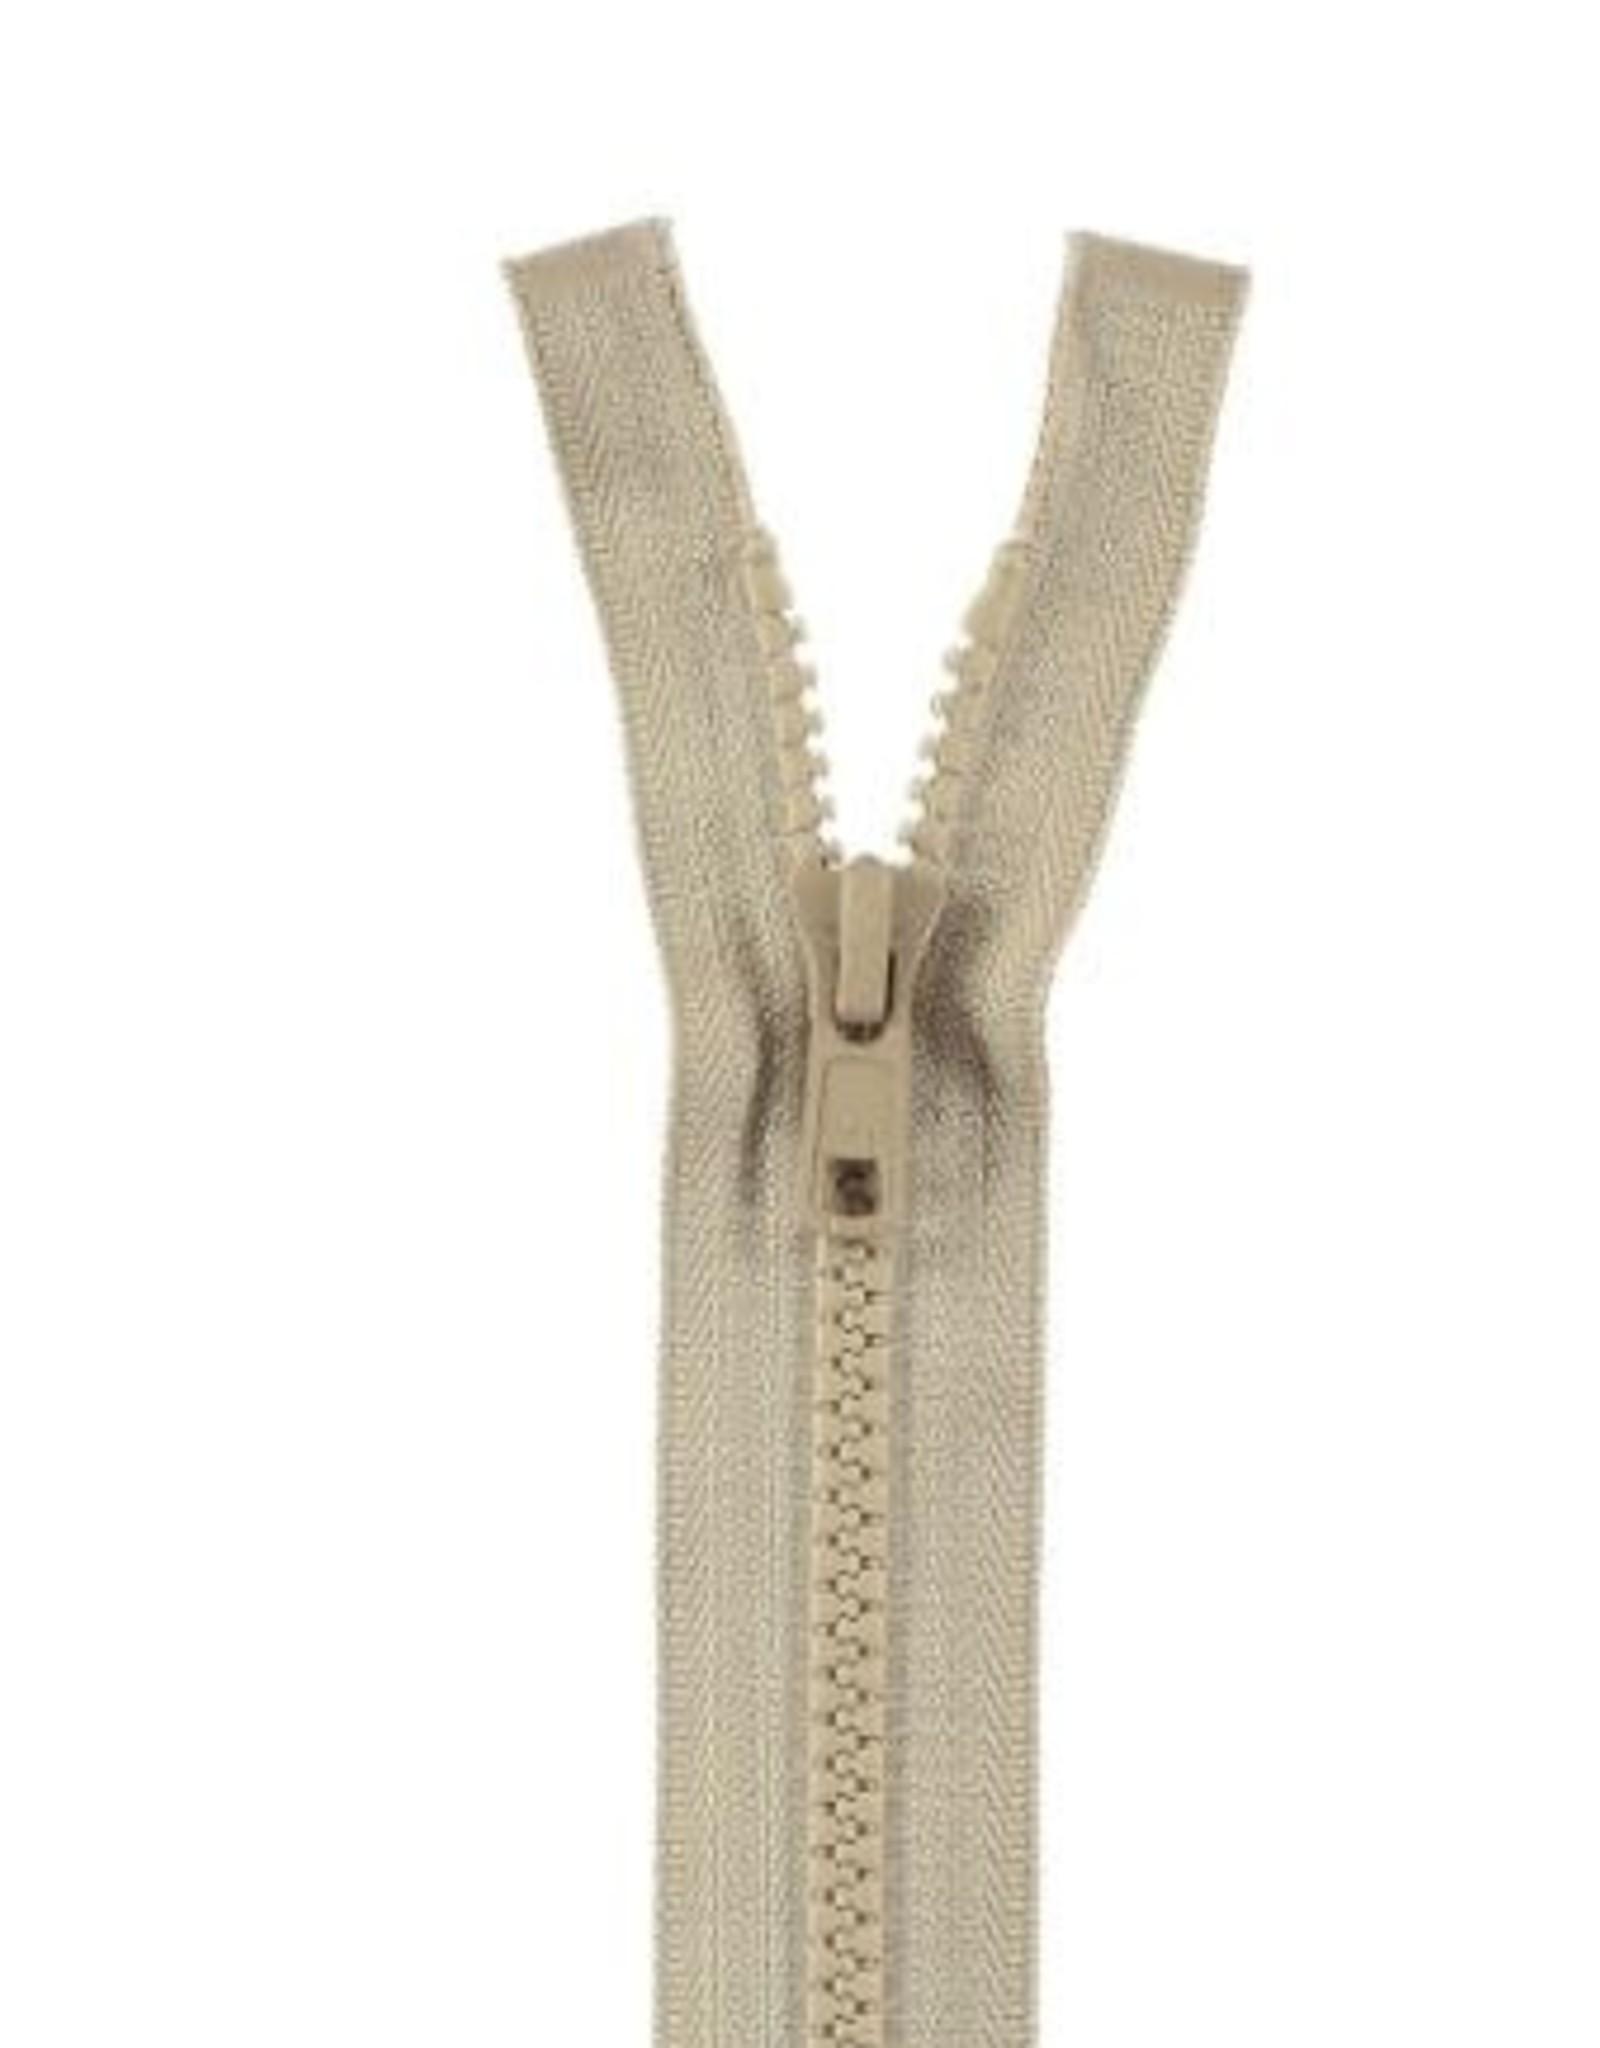 YKK BLOKRITS 5 DEELBAAR beige 573-30cm